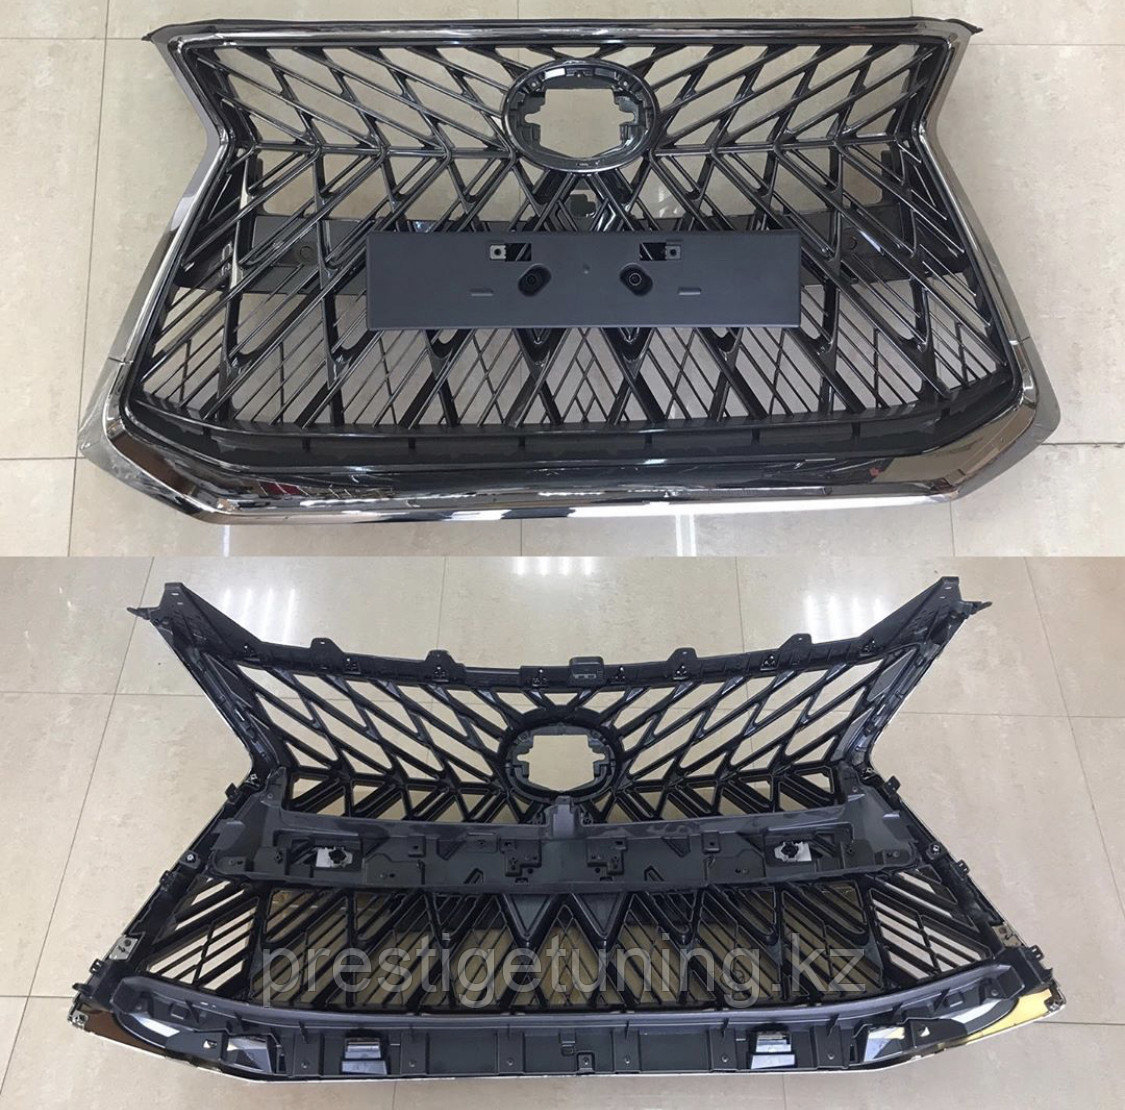 Решетка радиатора на Lexus LX570 2016- дизайн Black Vision